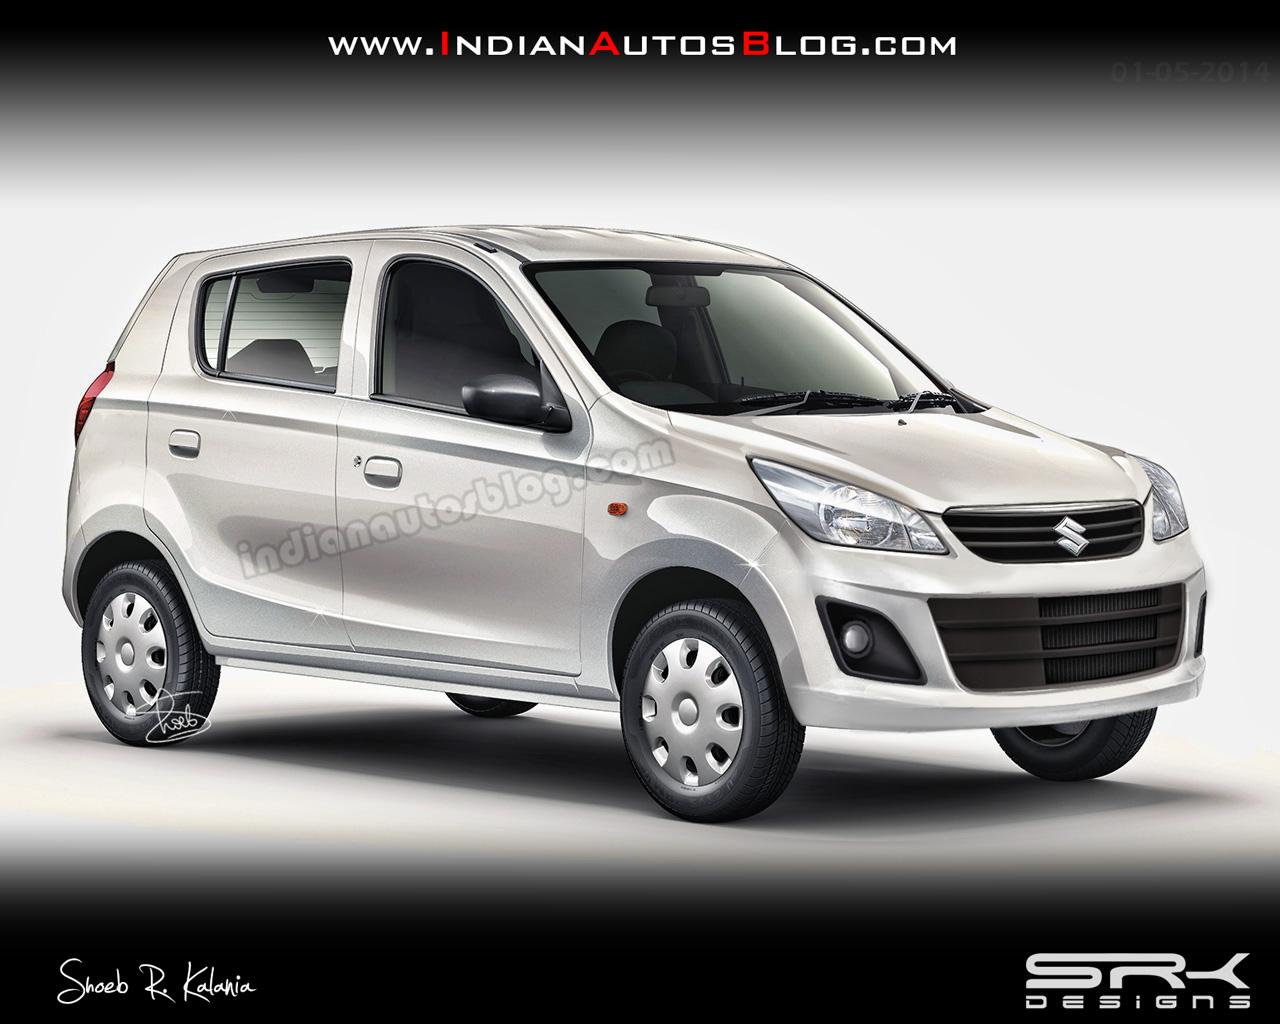 Maruti Alto 800 facelift rendering IAB